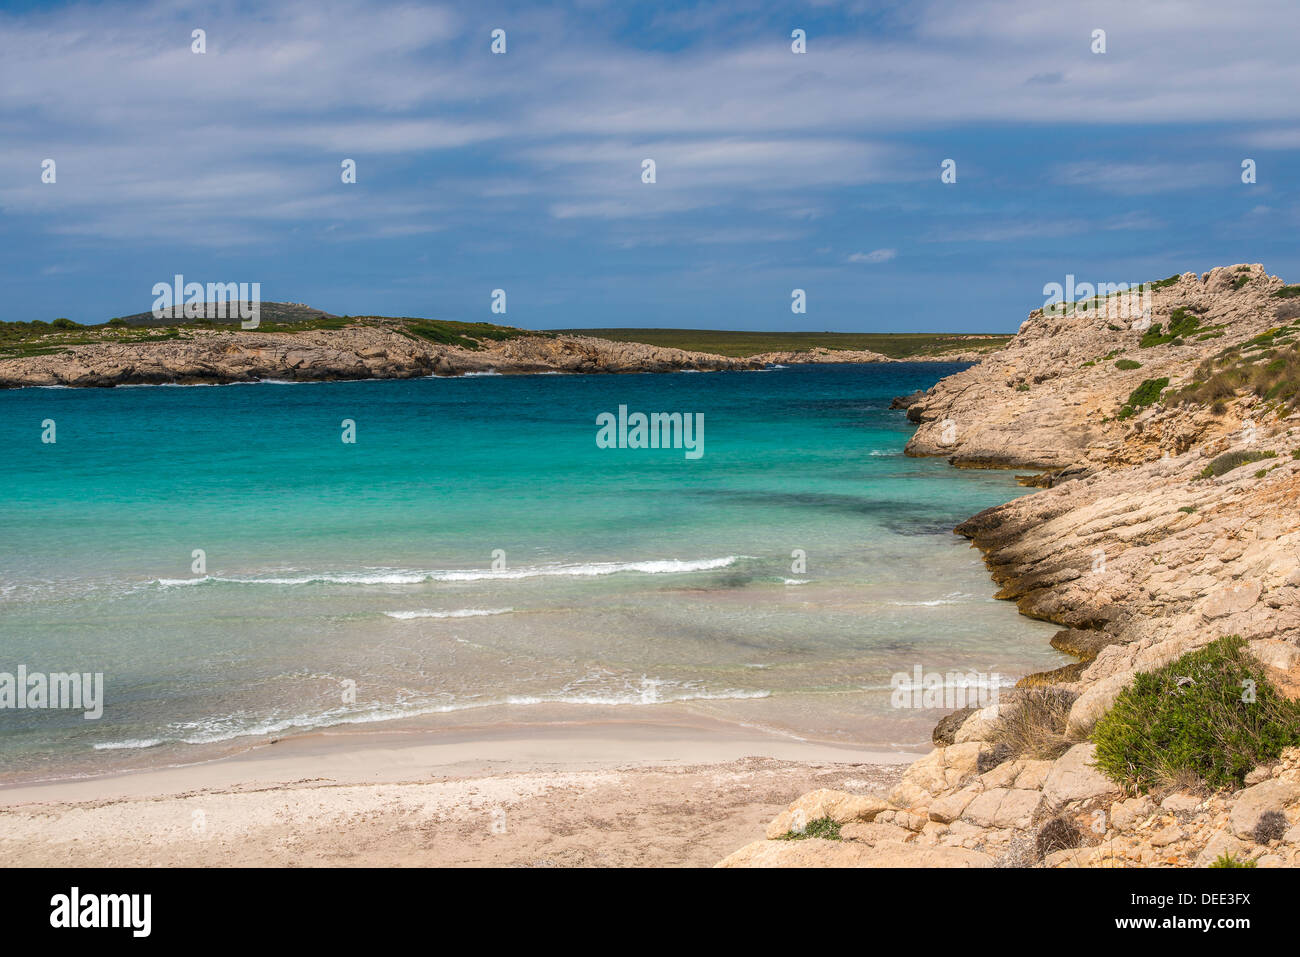 Türkisfarbene Meer am Strand von Son Saura, Menorca oder Menorca, Balearen, Spanien Stockbild